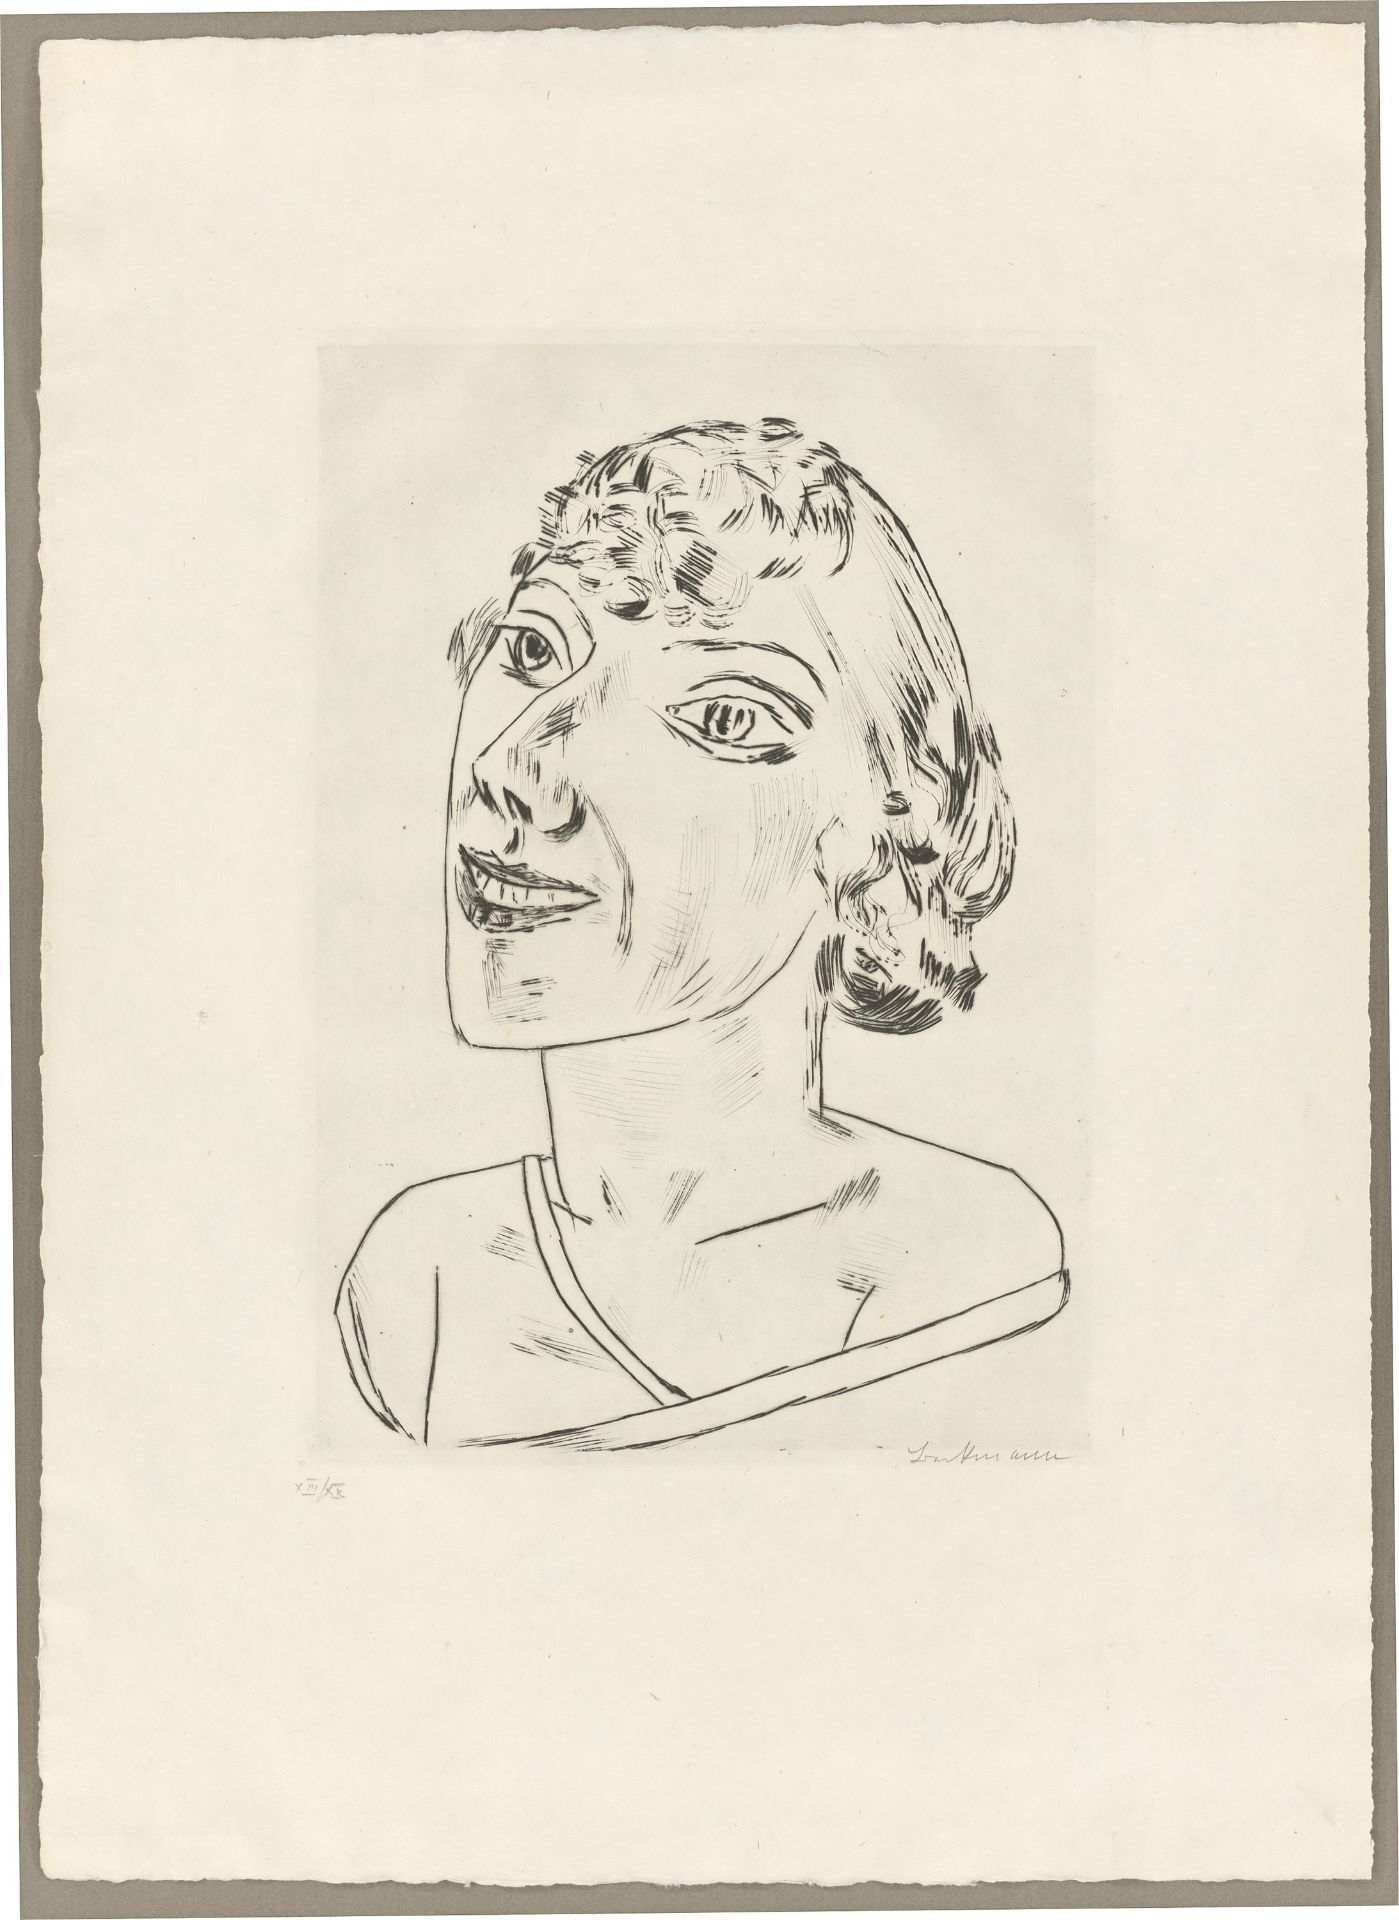 Los 1123 - Max Beckmann (Leipzig 1884 – 1950 New York)